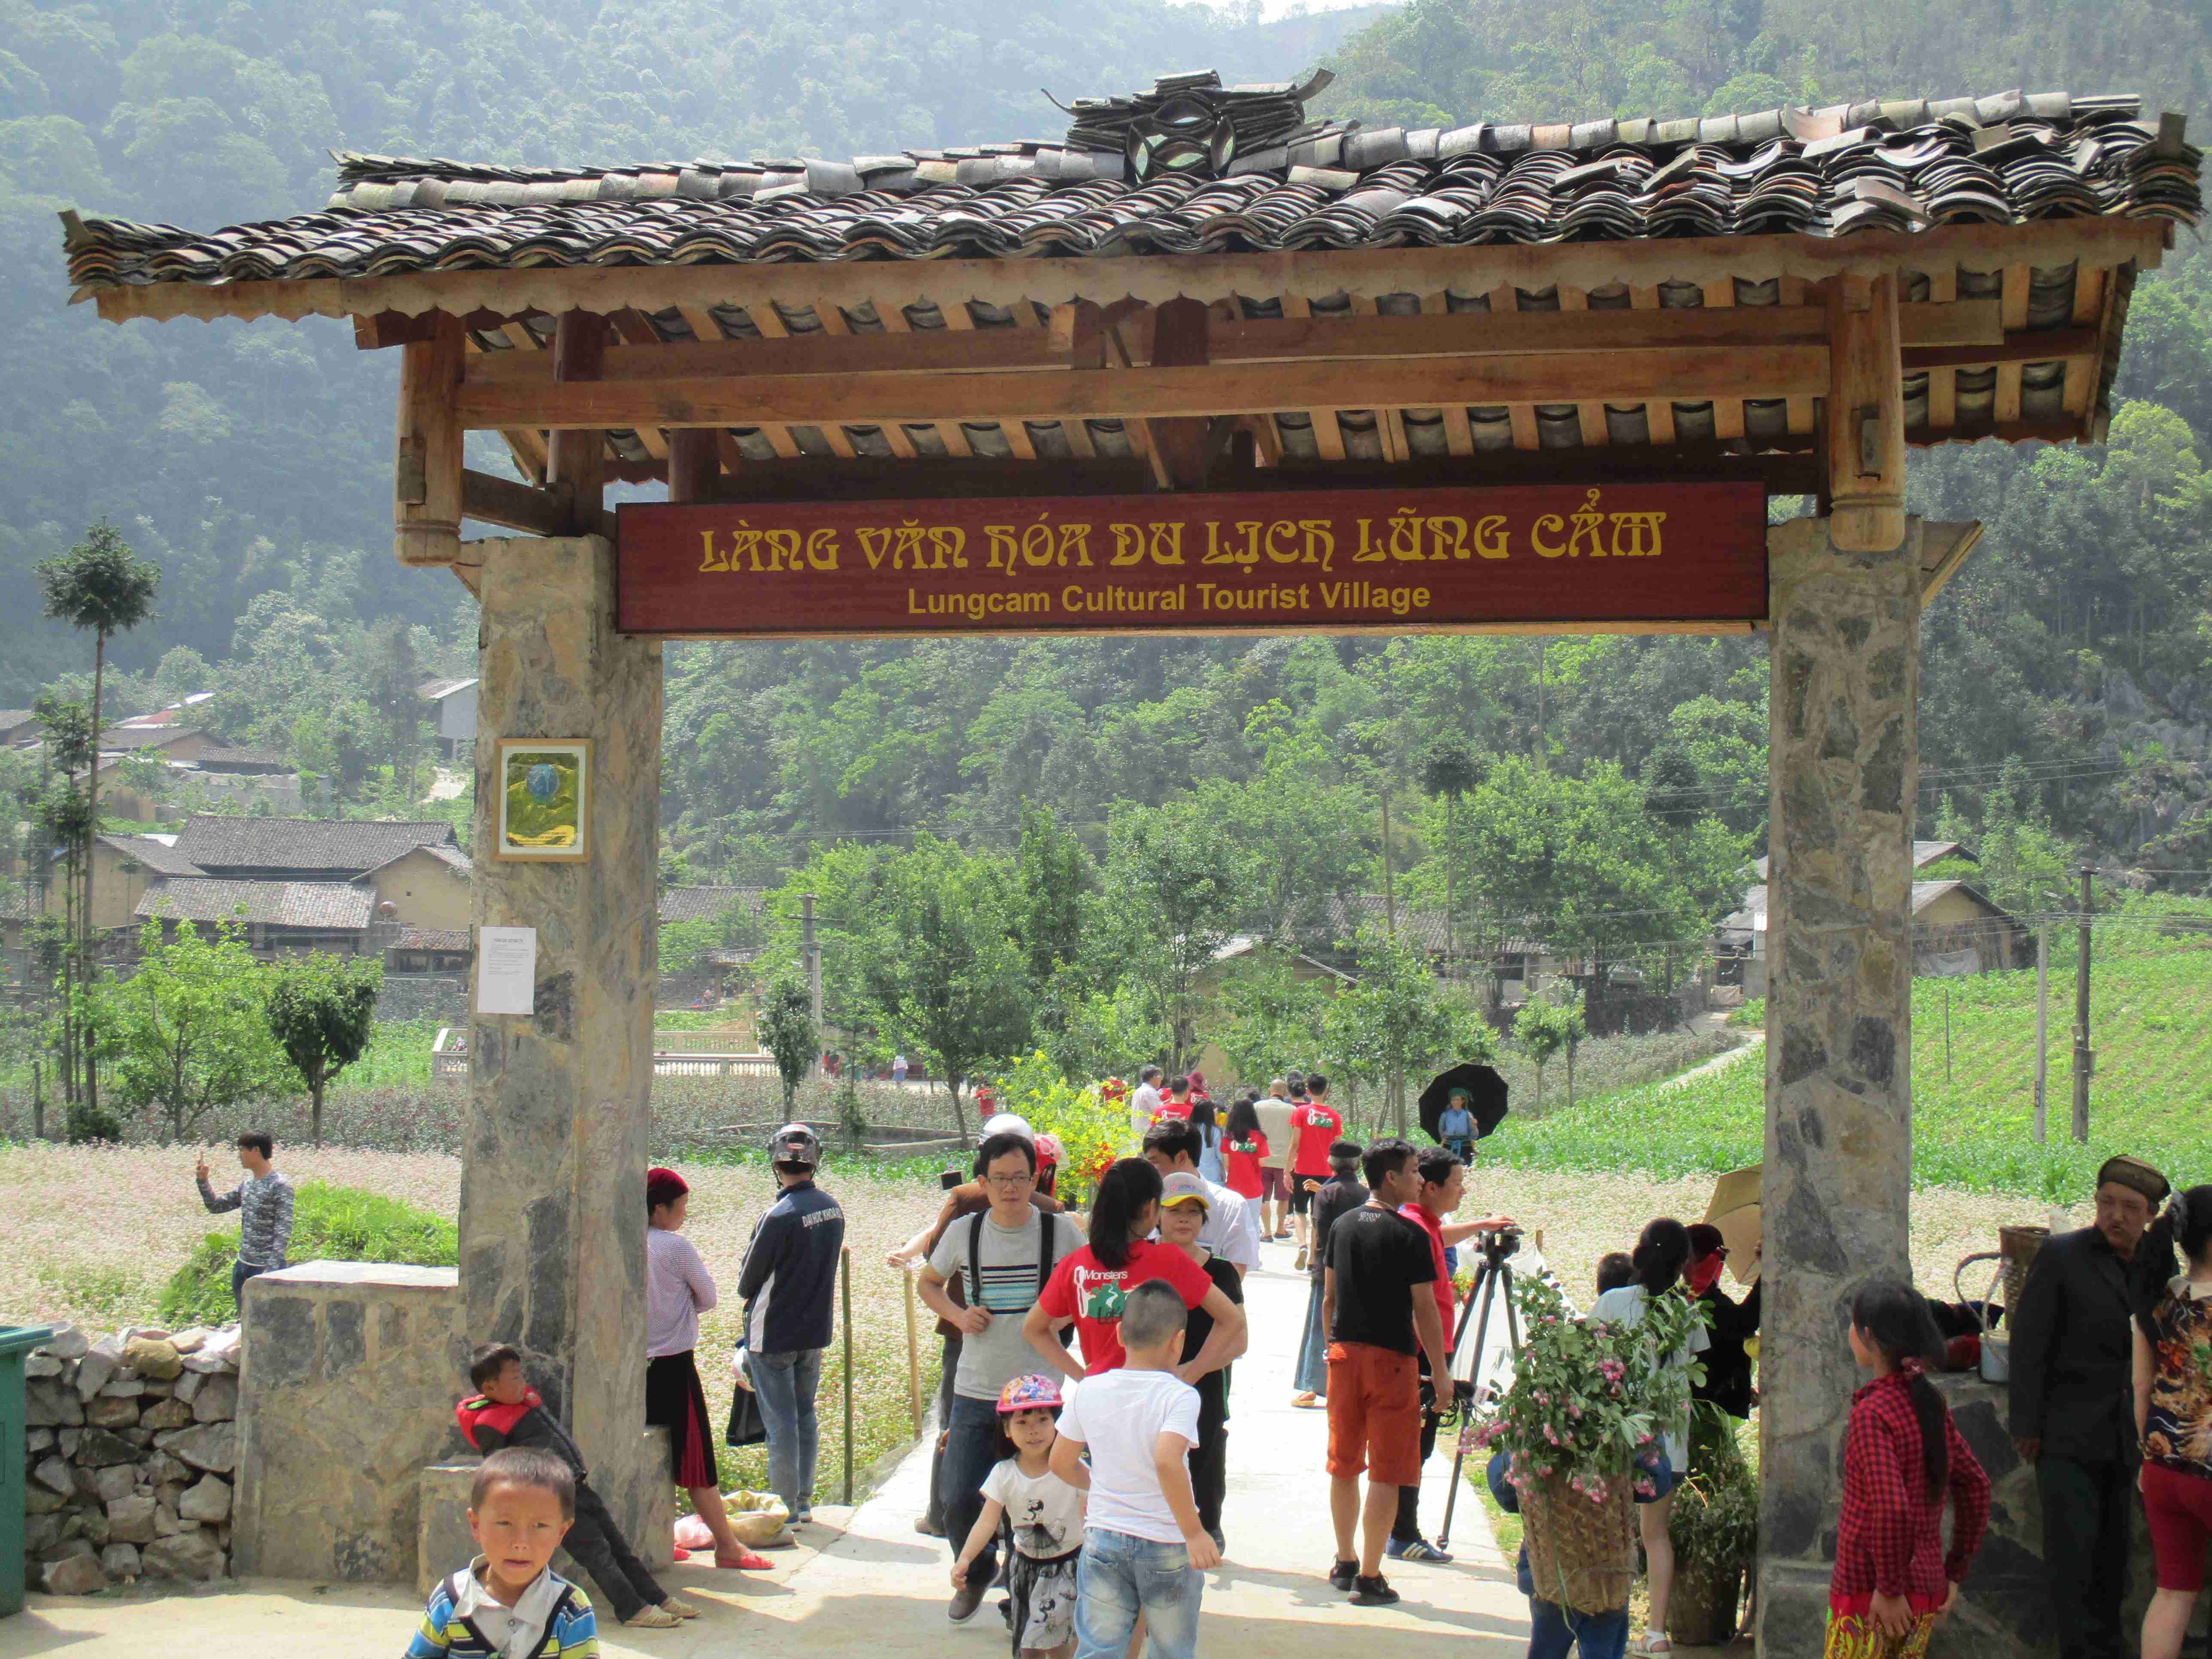 Impressive Lung Cam cultural tourist village in Dong Van karst plateau